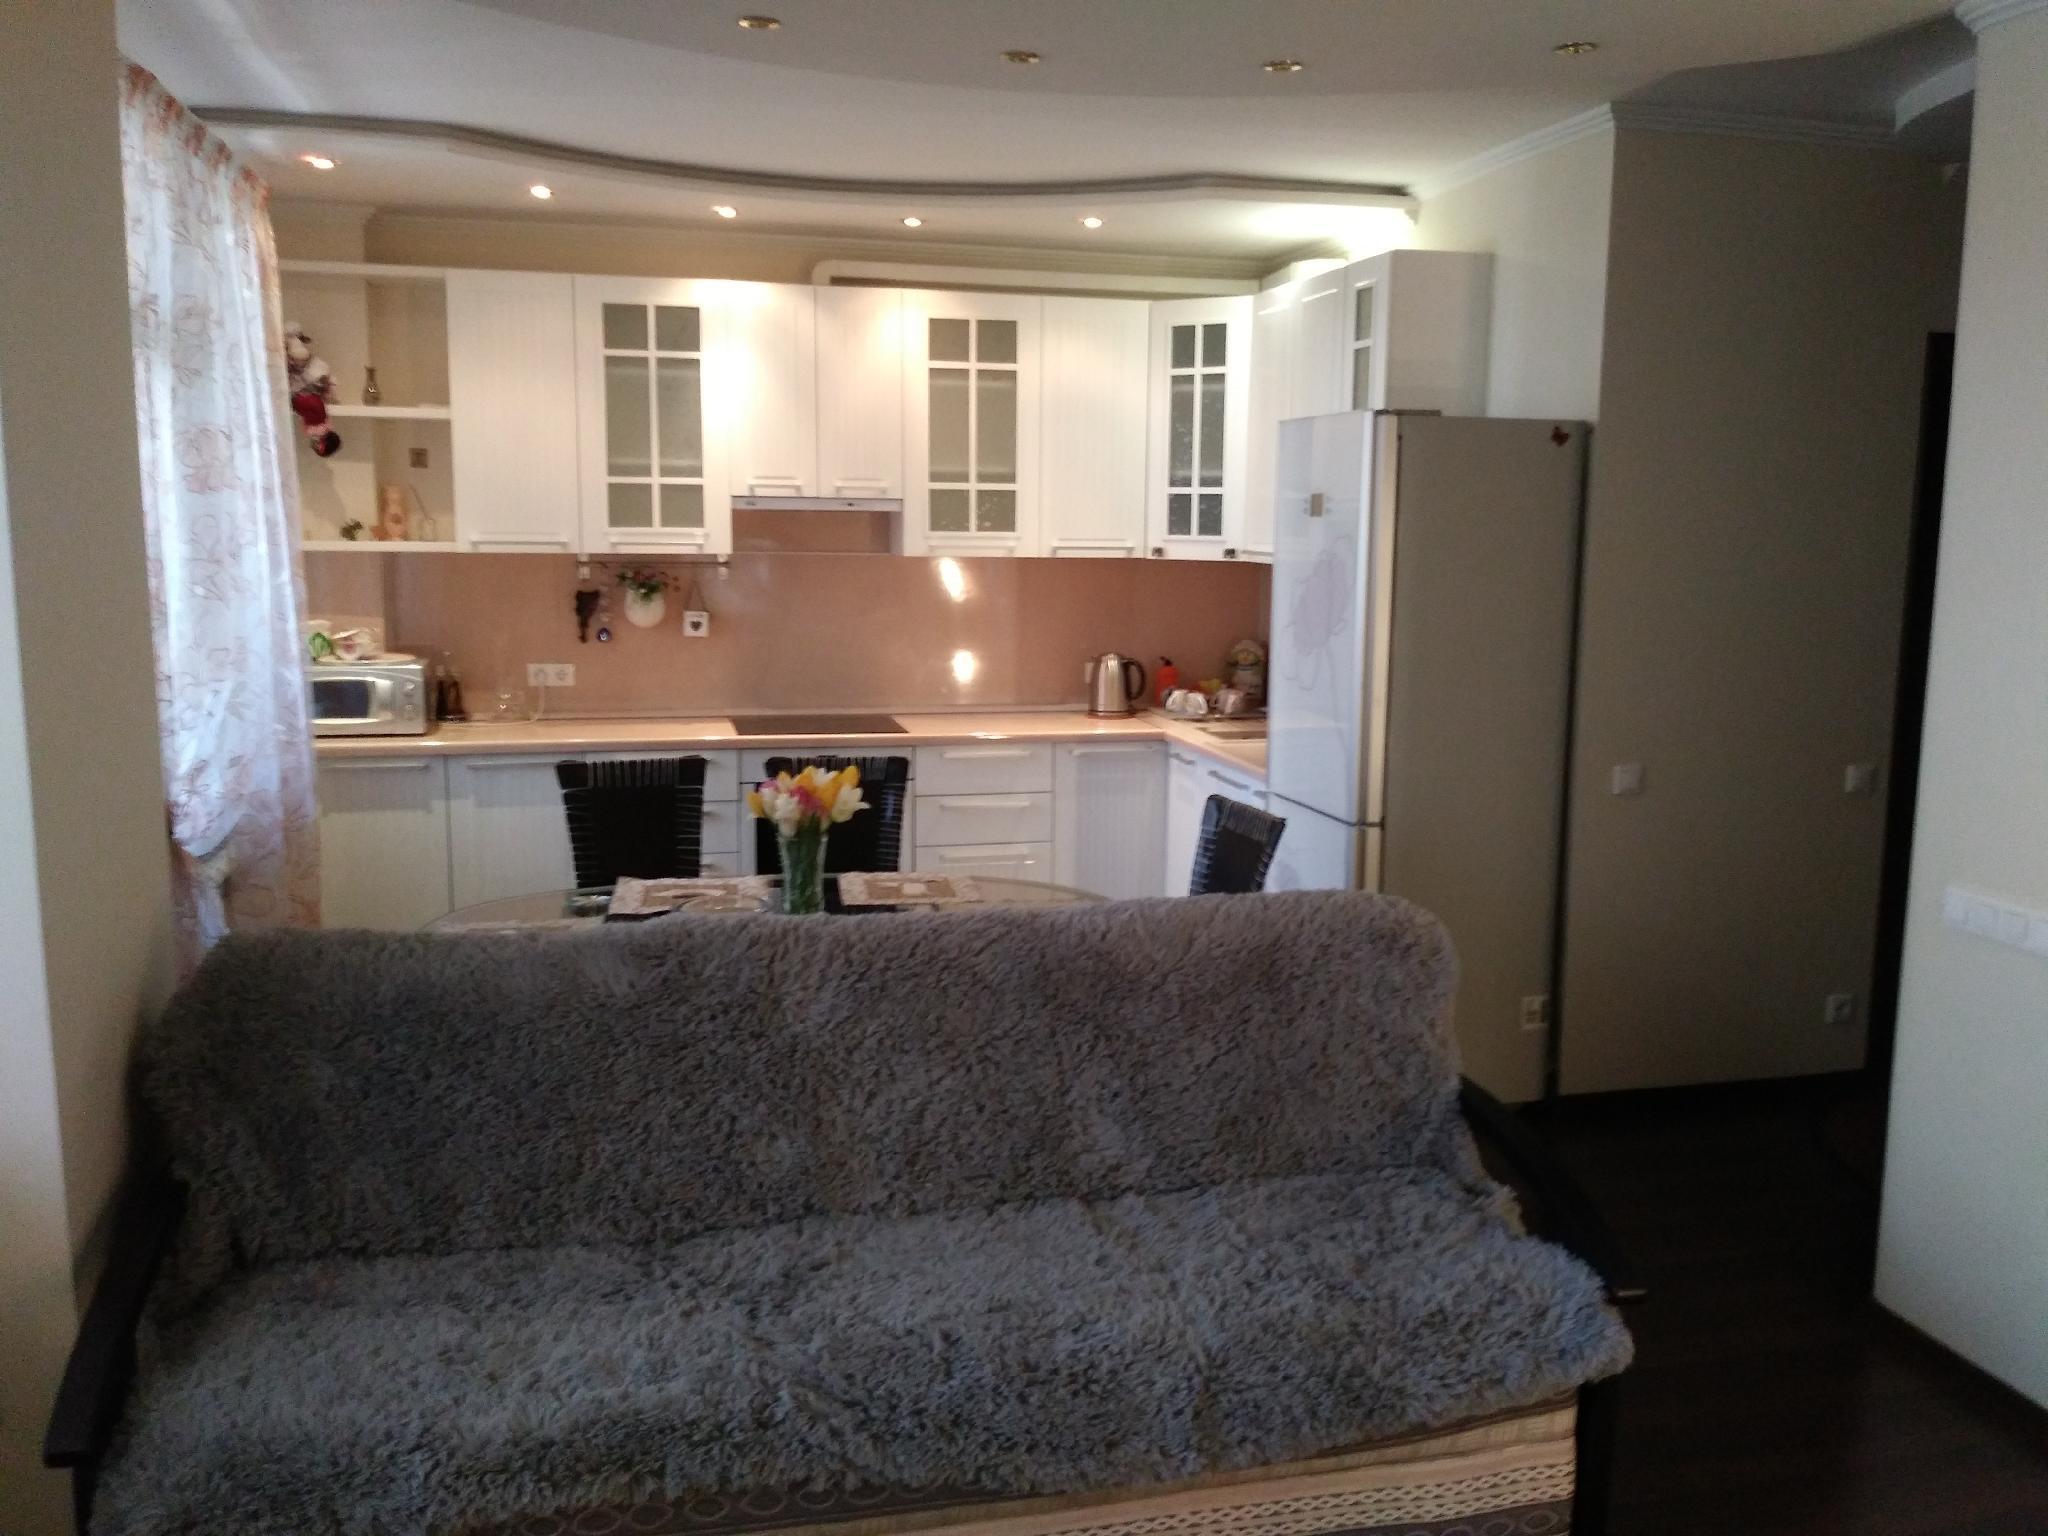 Apartments Inspiration